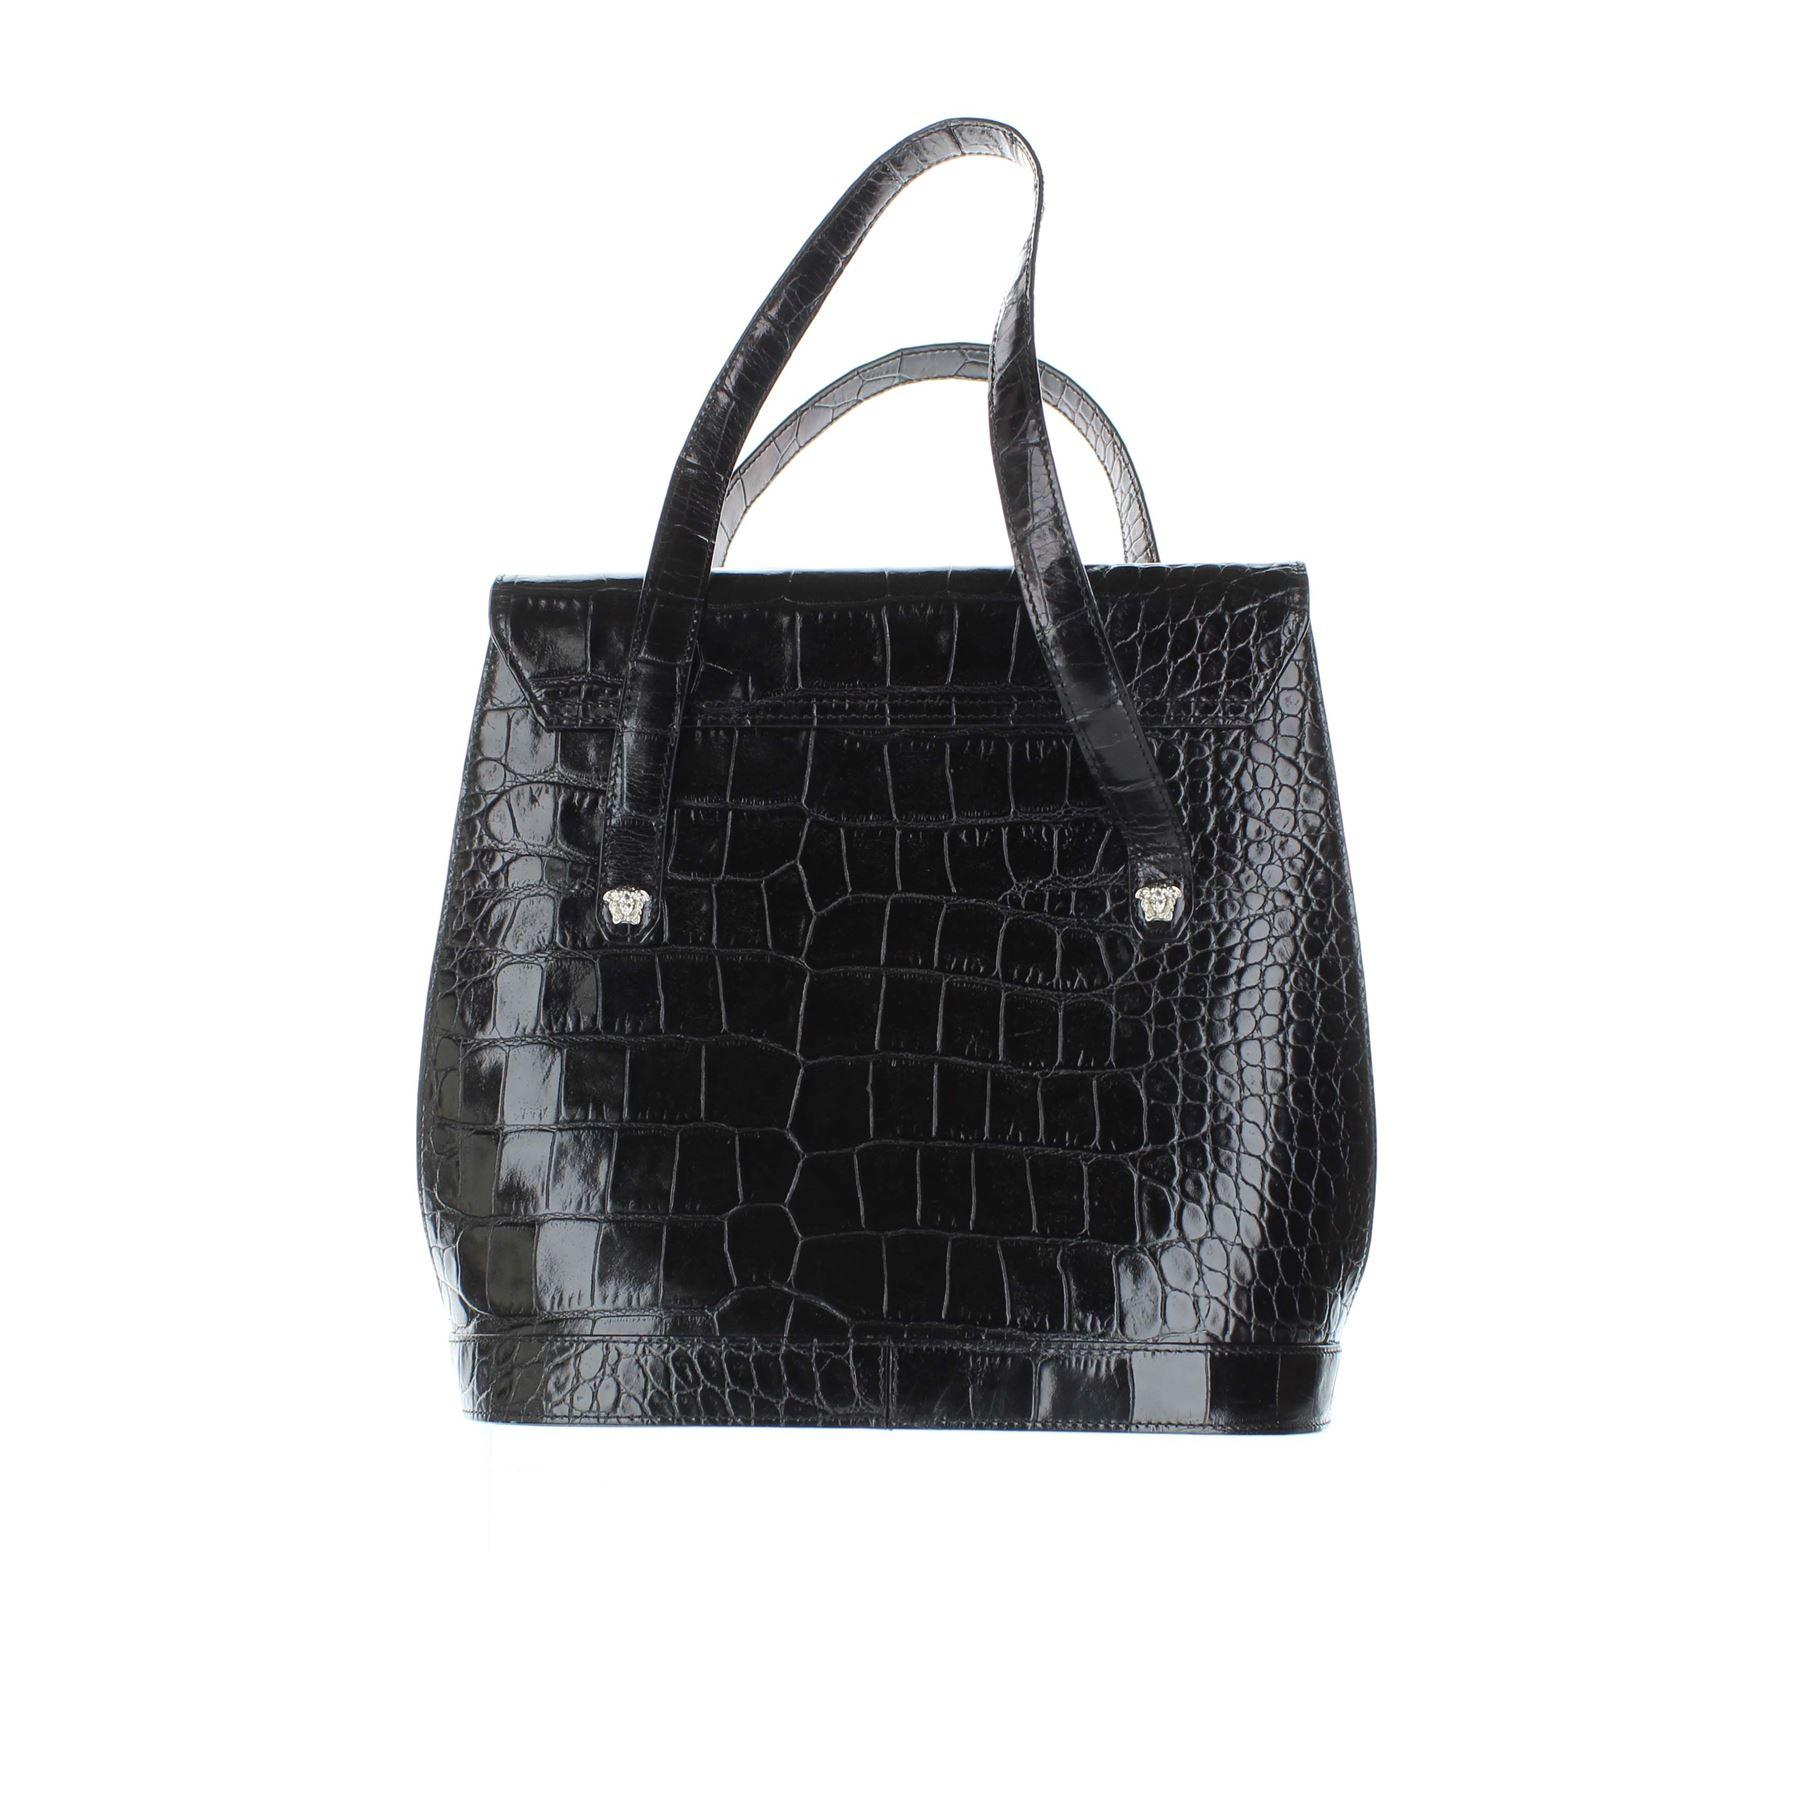 Poignée Cuir Noir En Versace Sac qCP6R